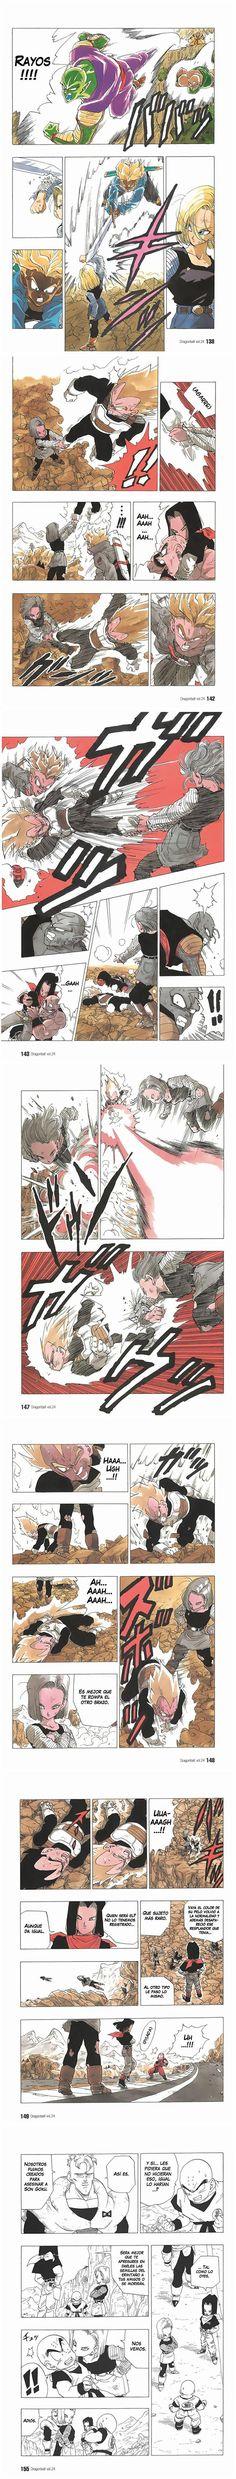 Some scenes of my favorite battle: No 18 Vs Vegeta    Manga Ep 354 Dragon Ball Z   Español Latino